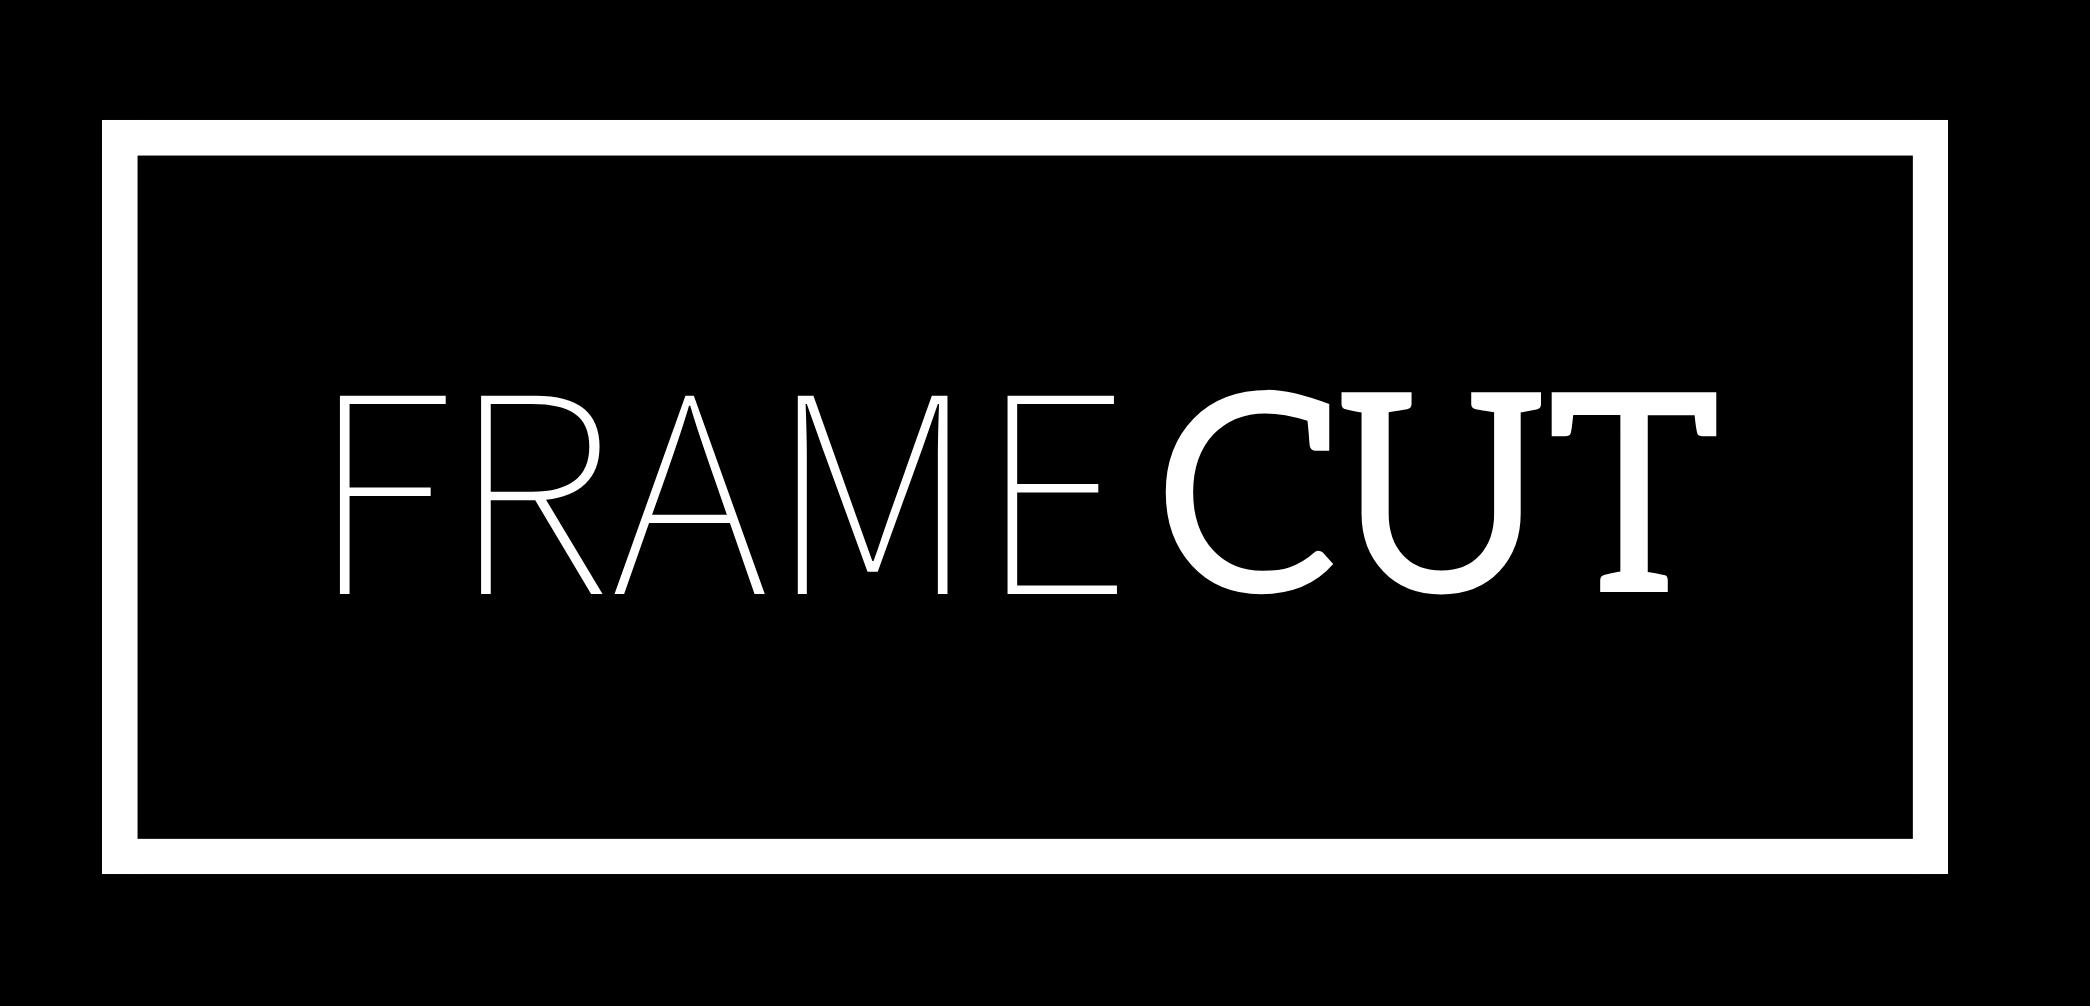 FrameCut